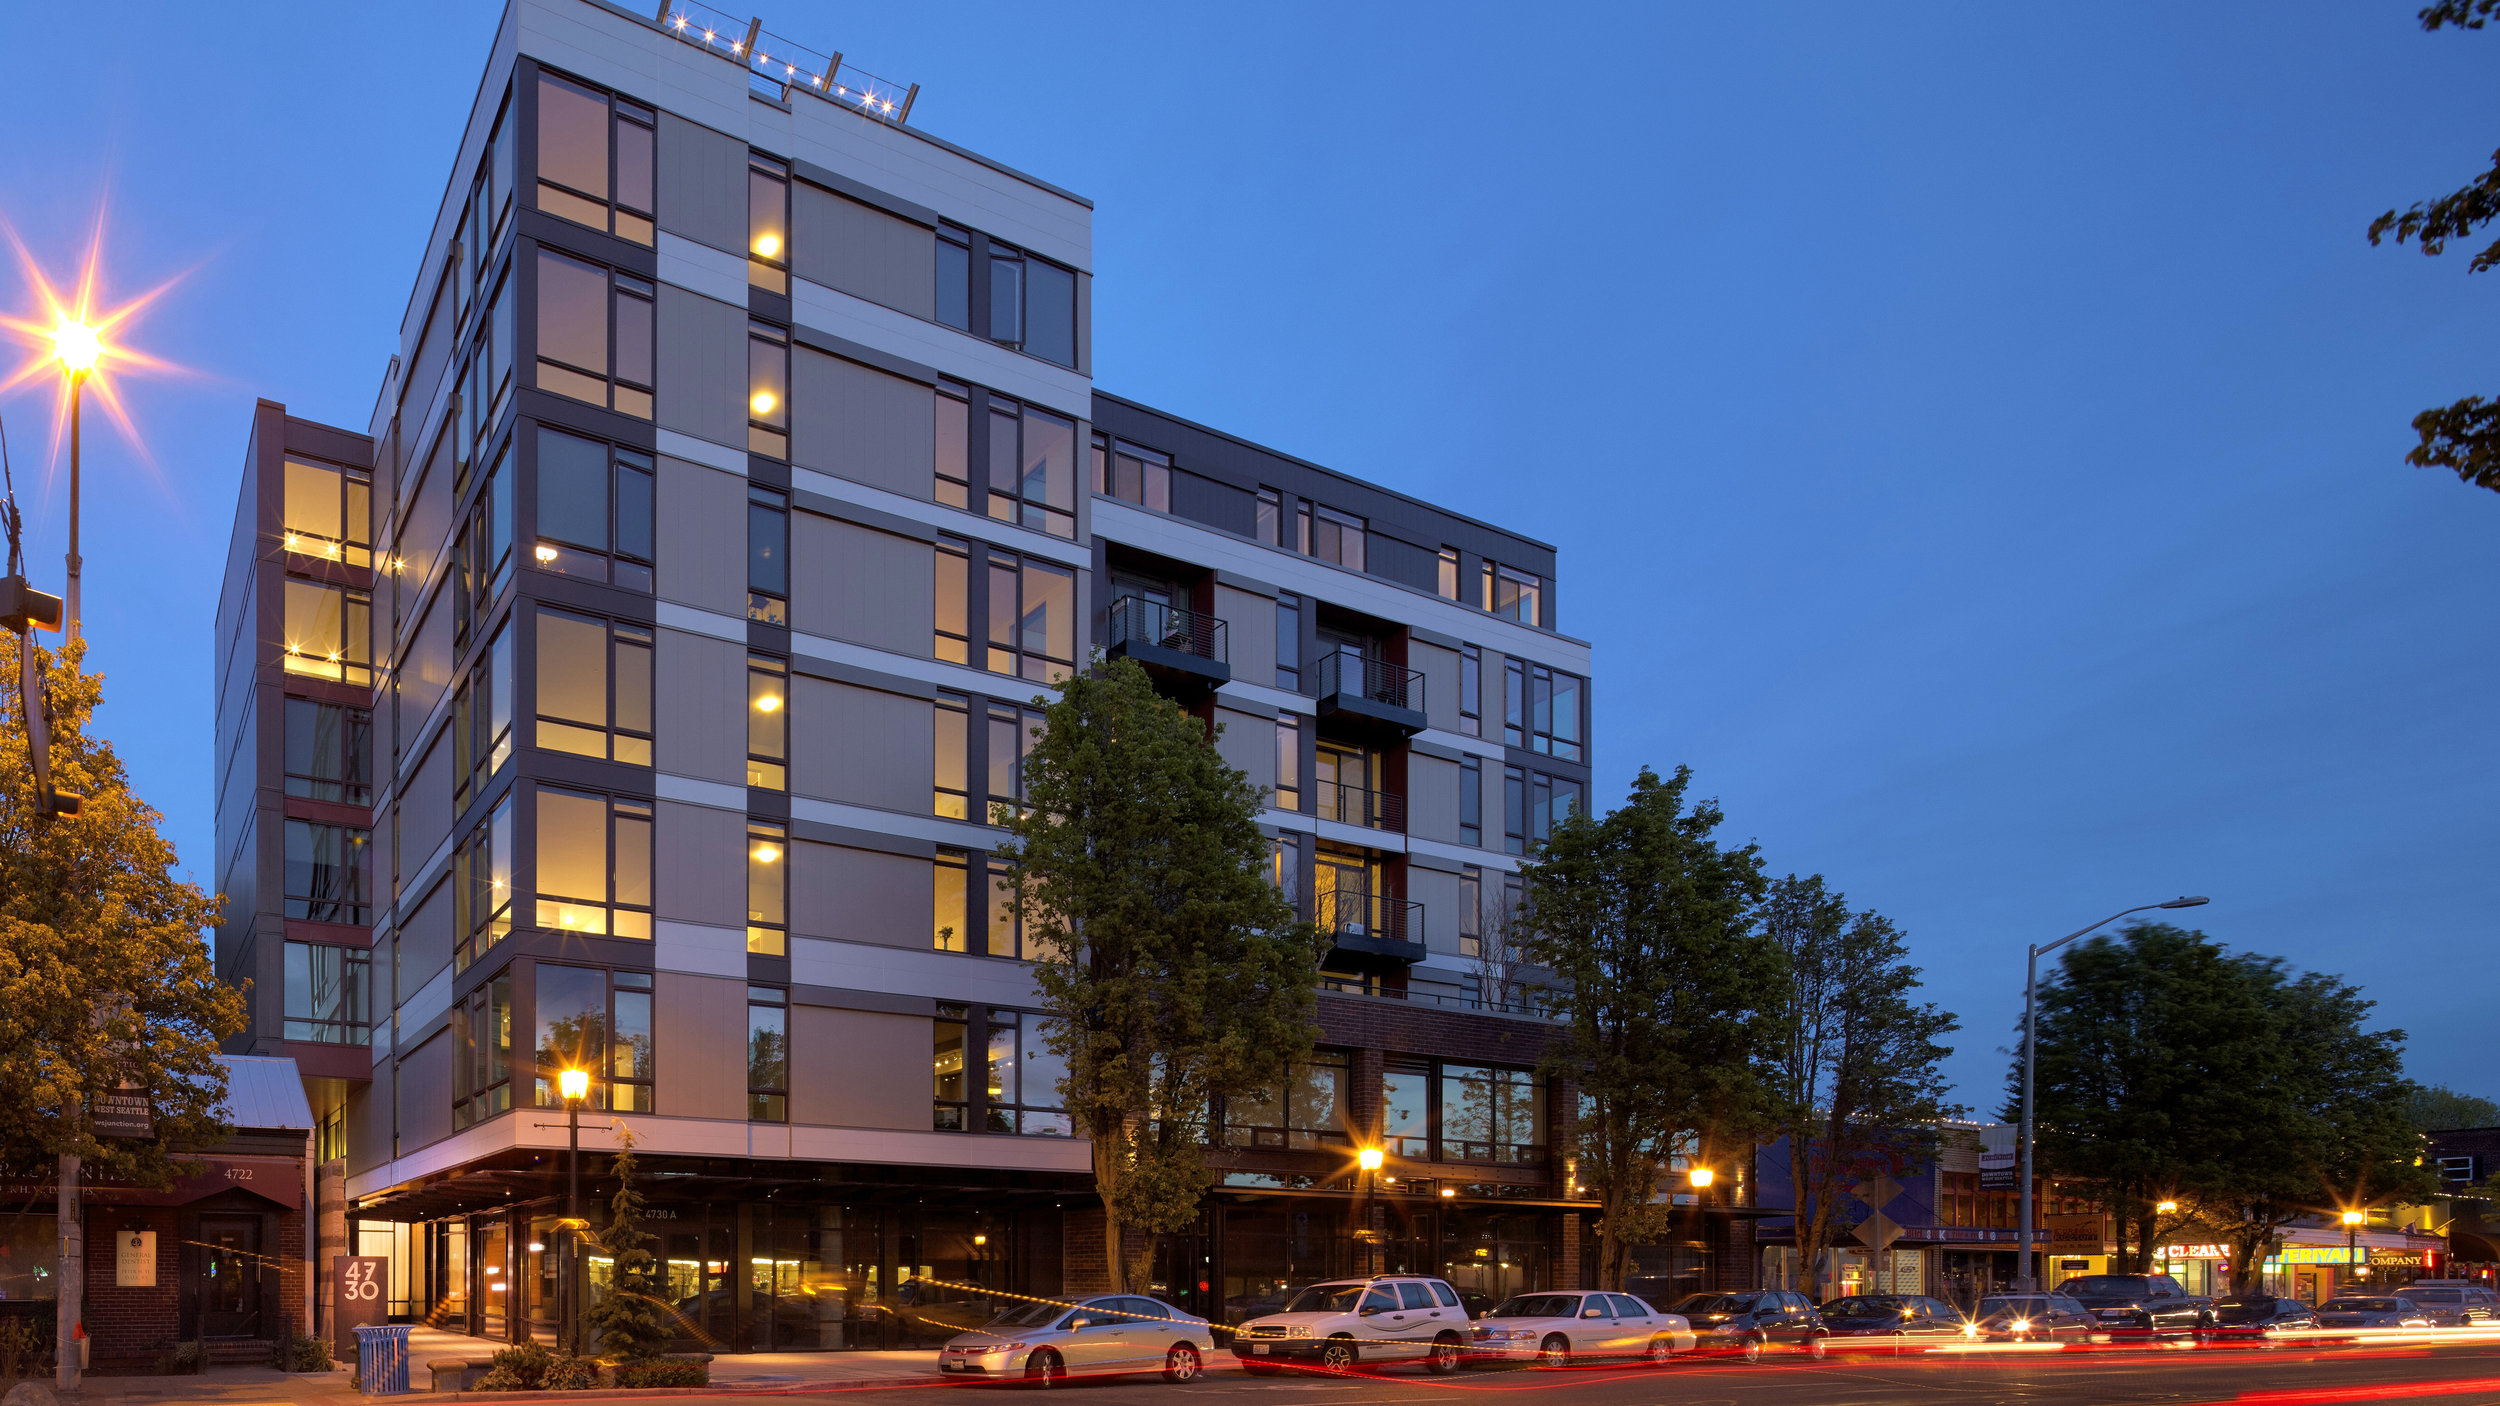 4730 California   Seattle, Washington